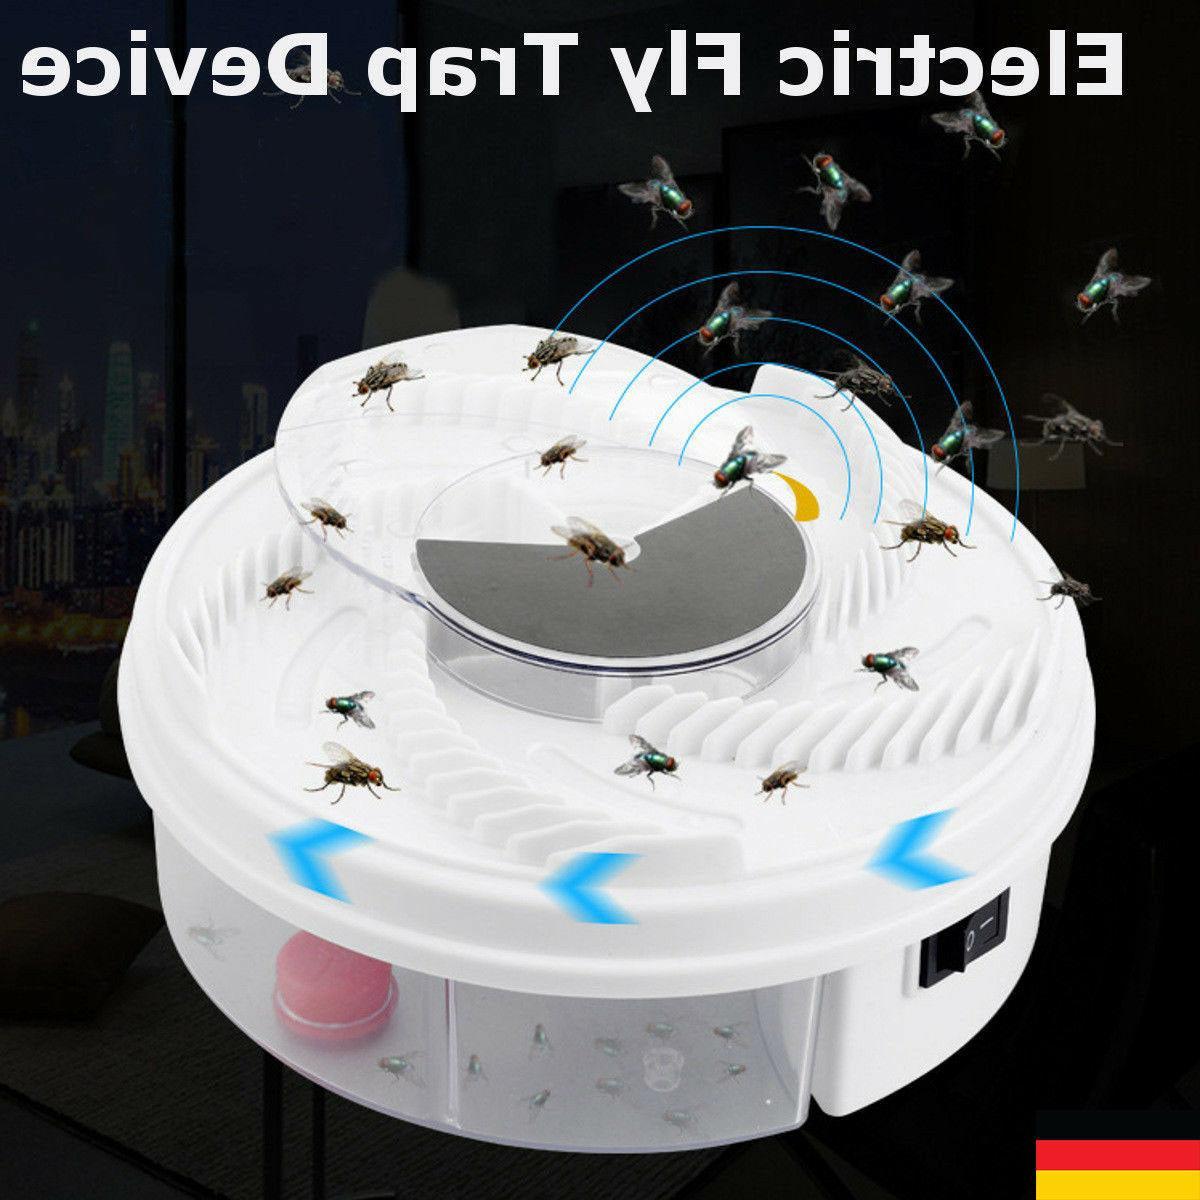 electric usb automatic flycatcher fly trap pest